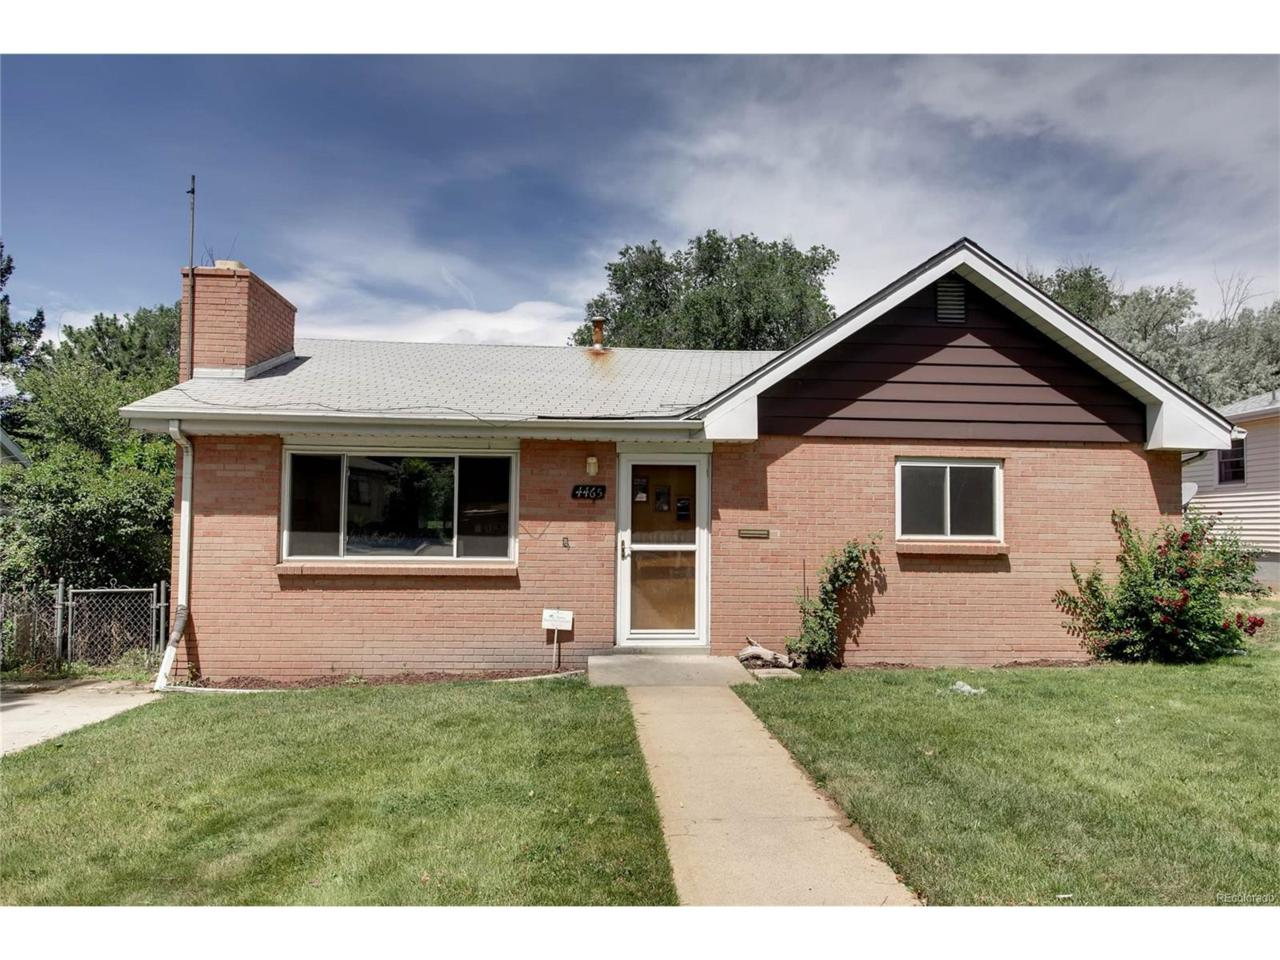 4465 S Elati Street, Englewood, CO 80110 (MLS #6965627) :: 8z Real Estate